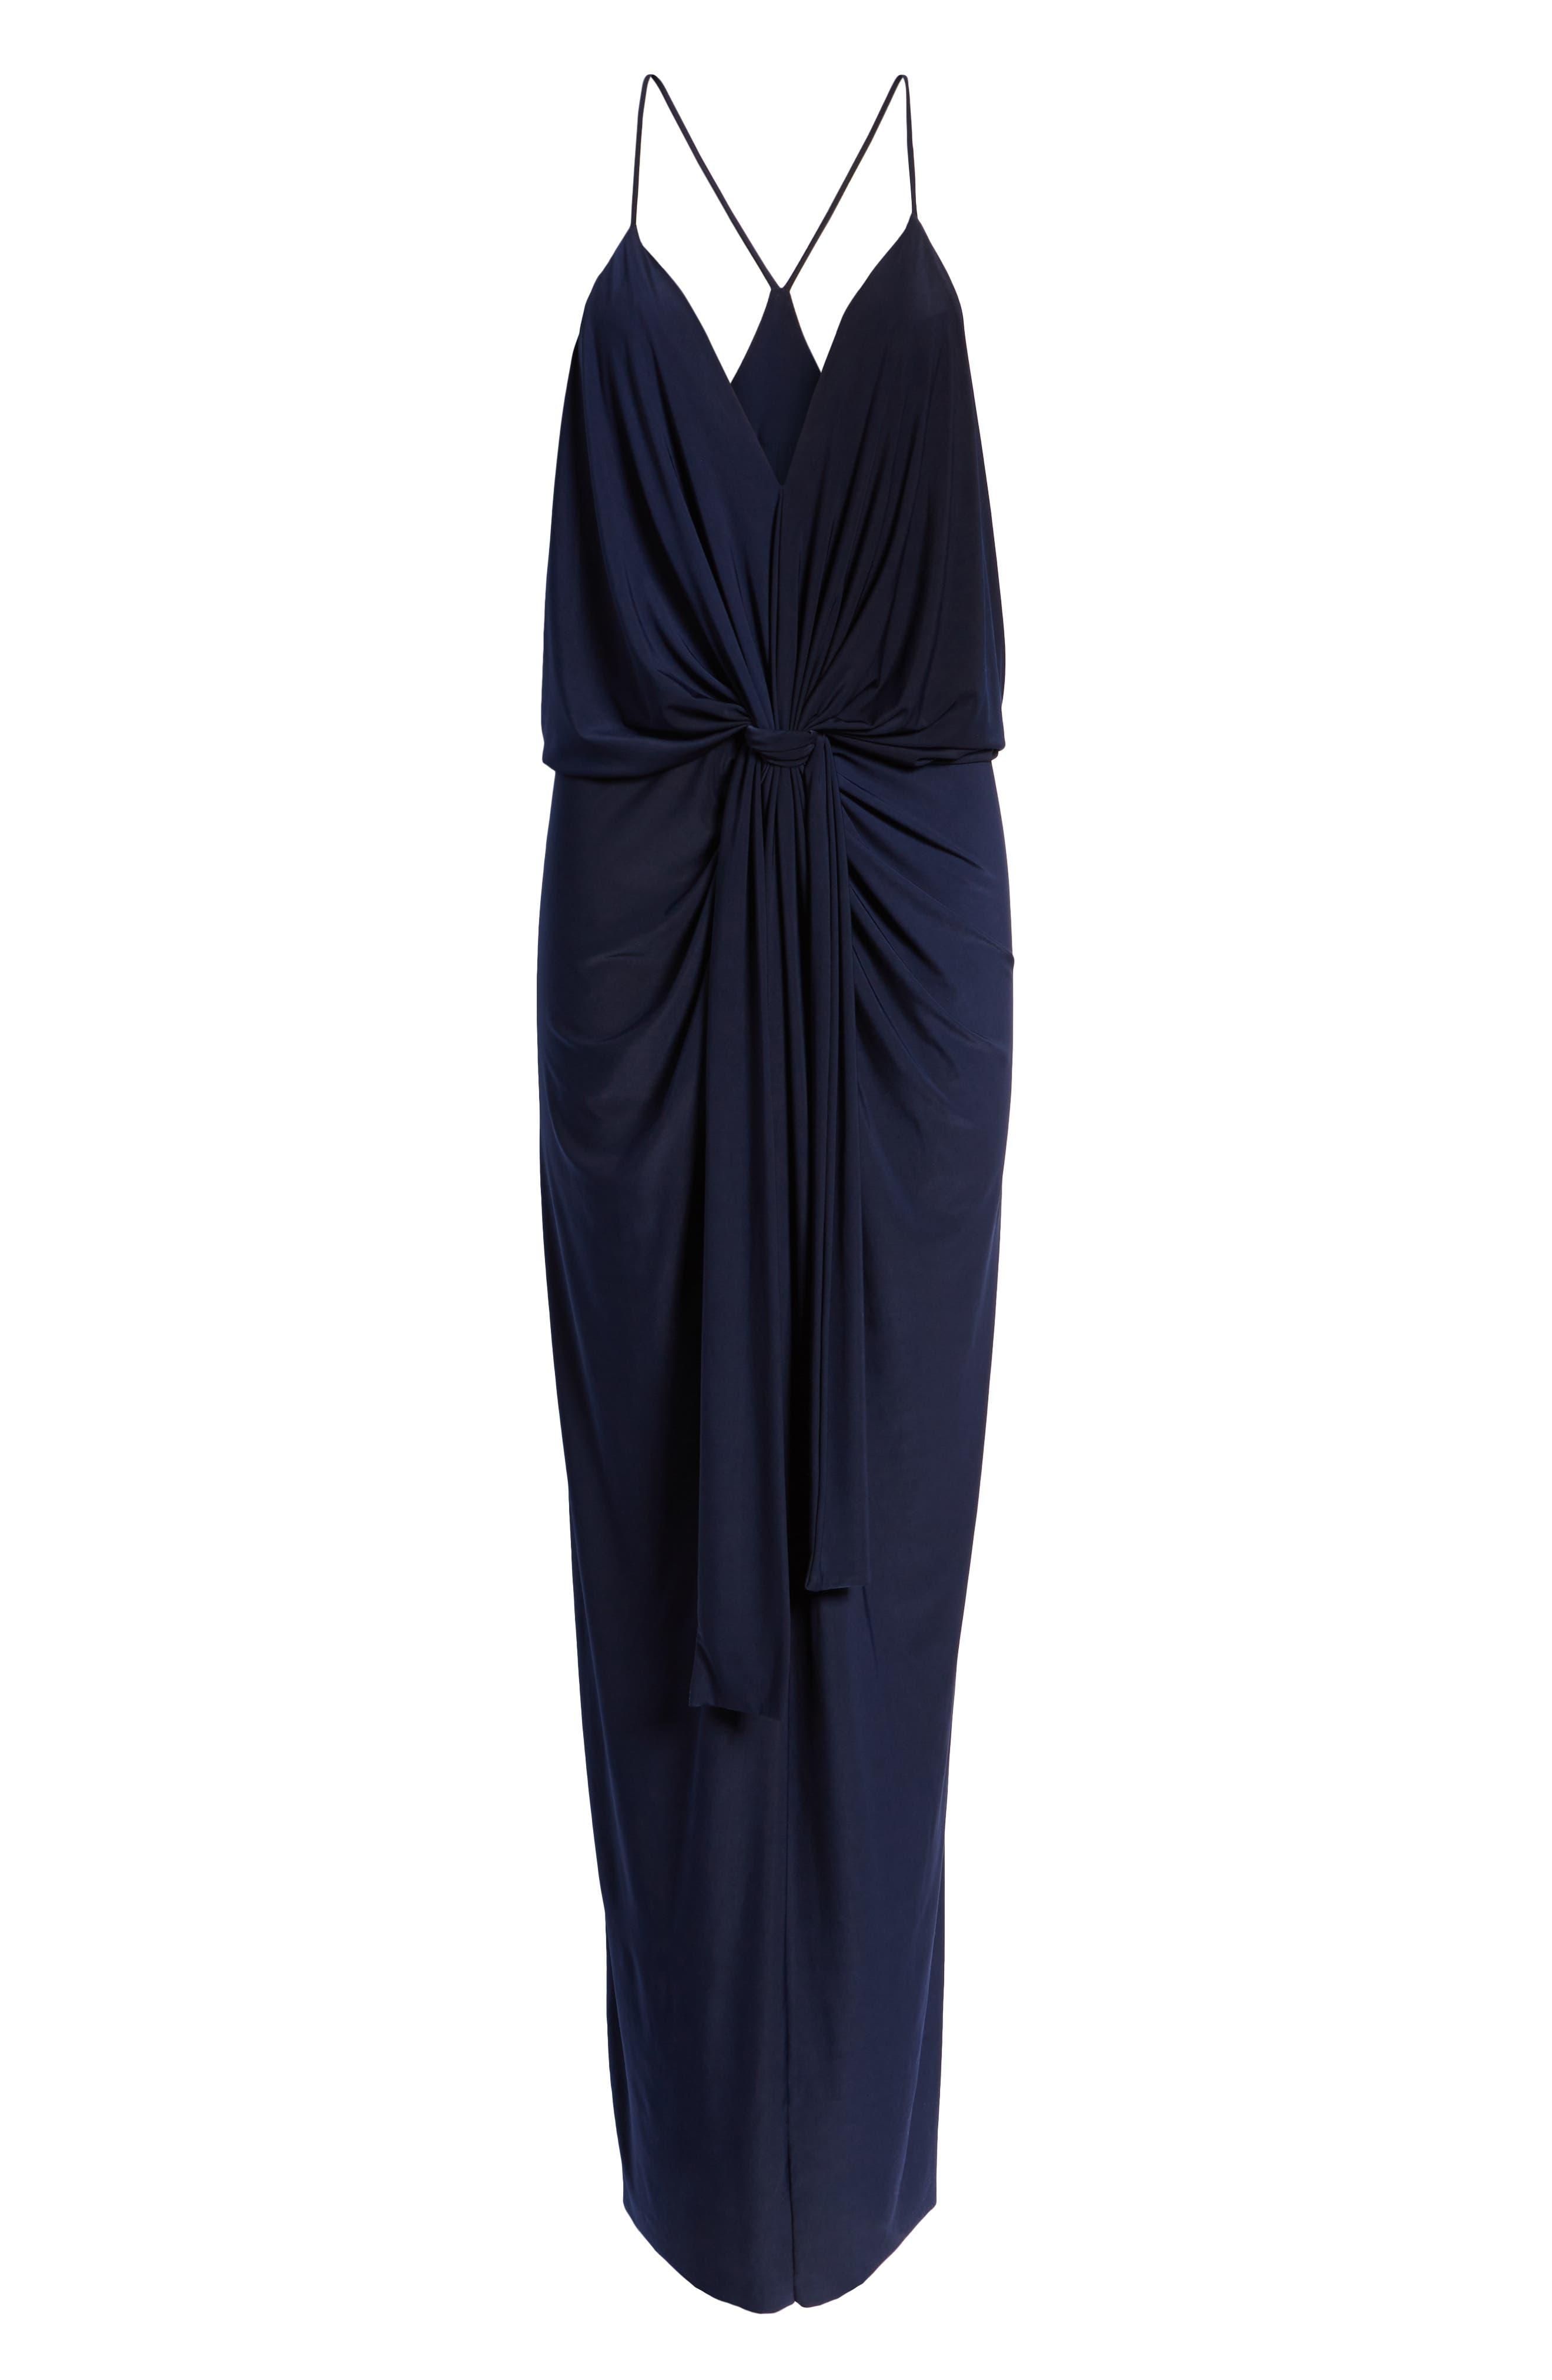 Domino Knot Maxi Dress,                             Alternate thumbnail 7, color,                             MIDNIGHT